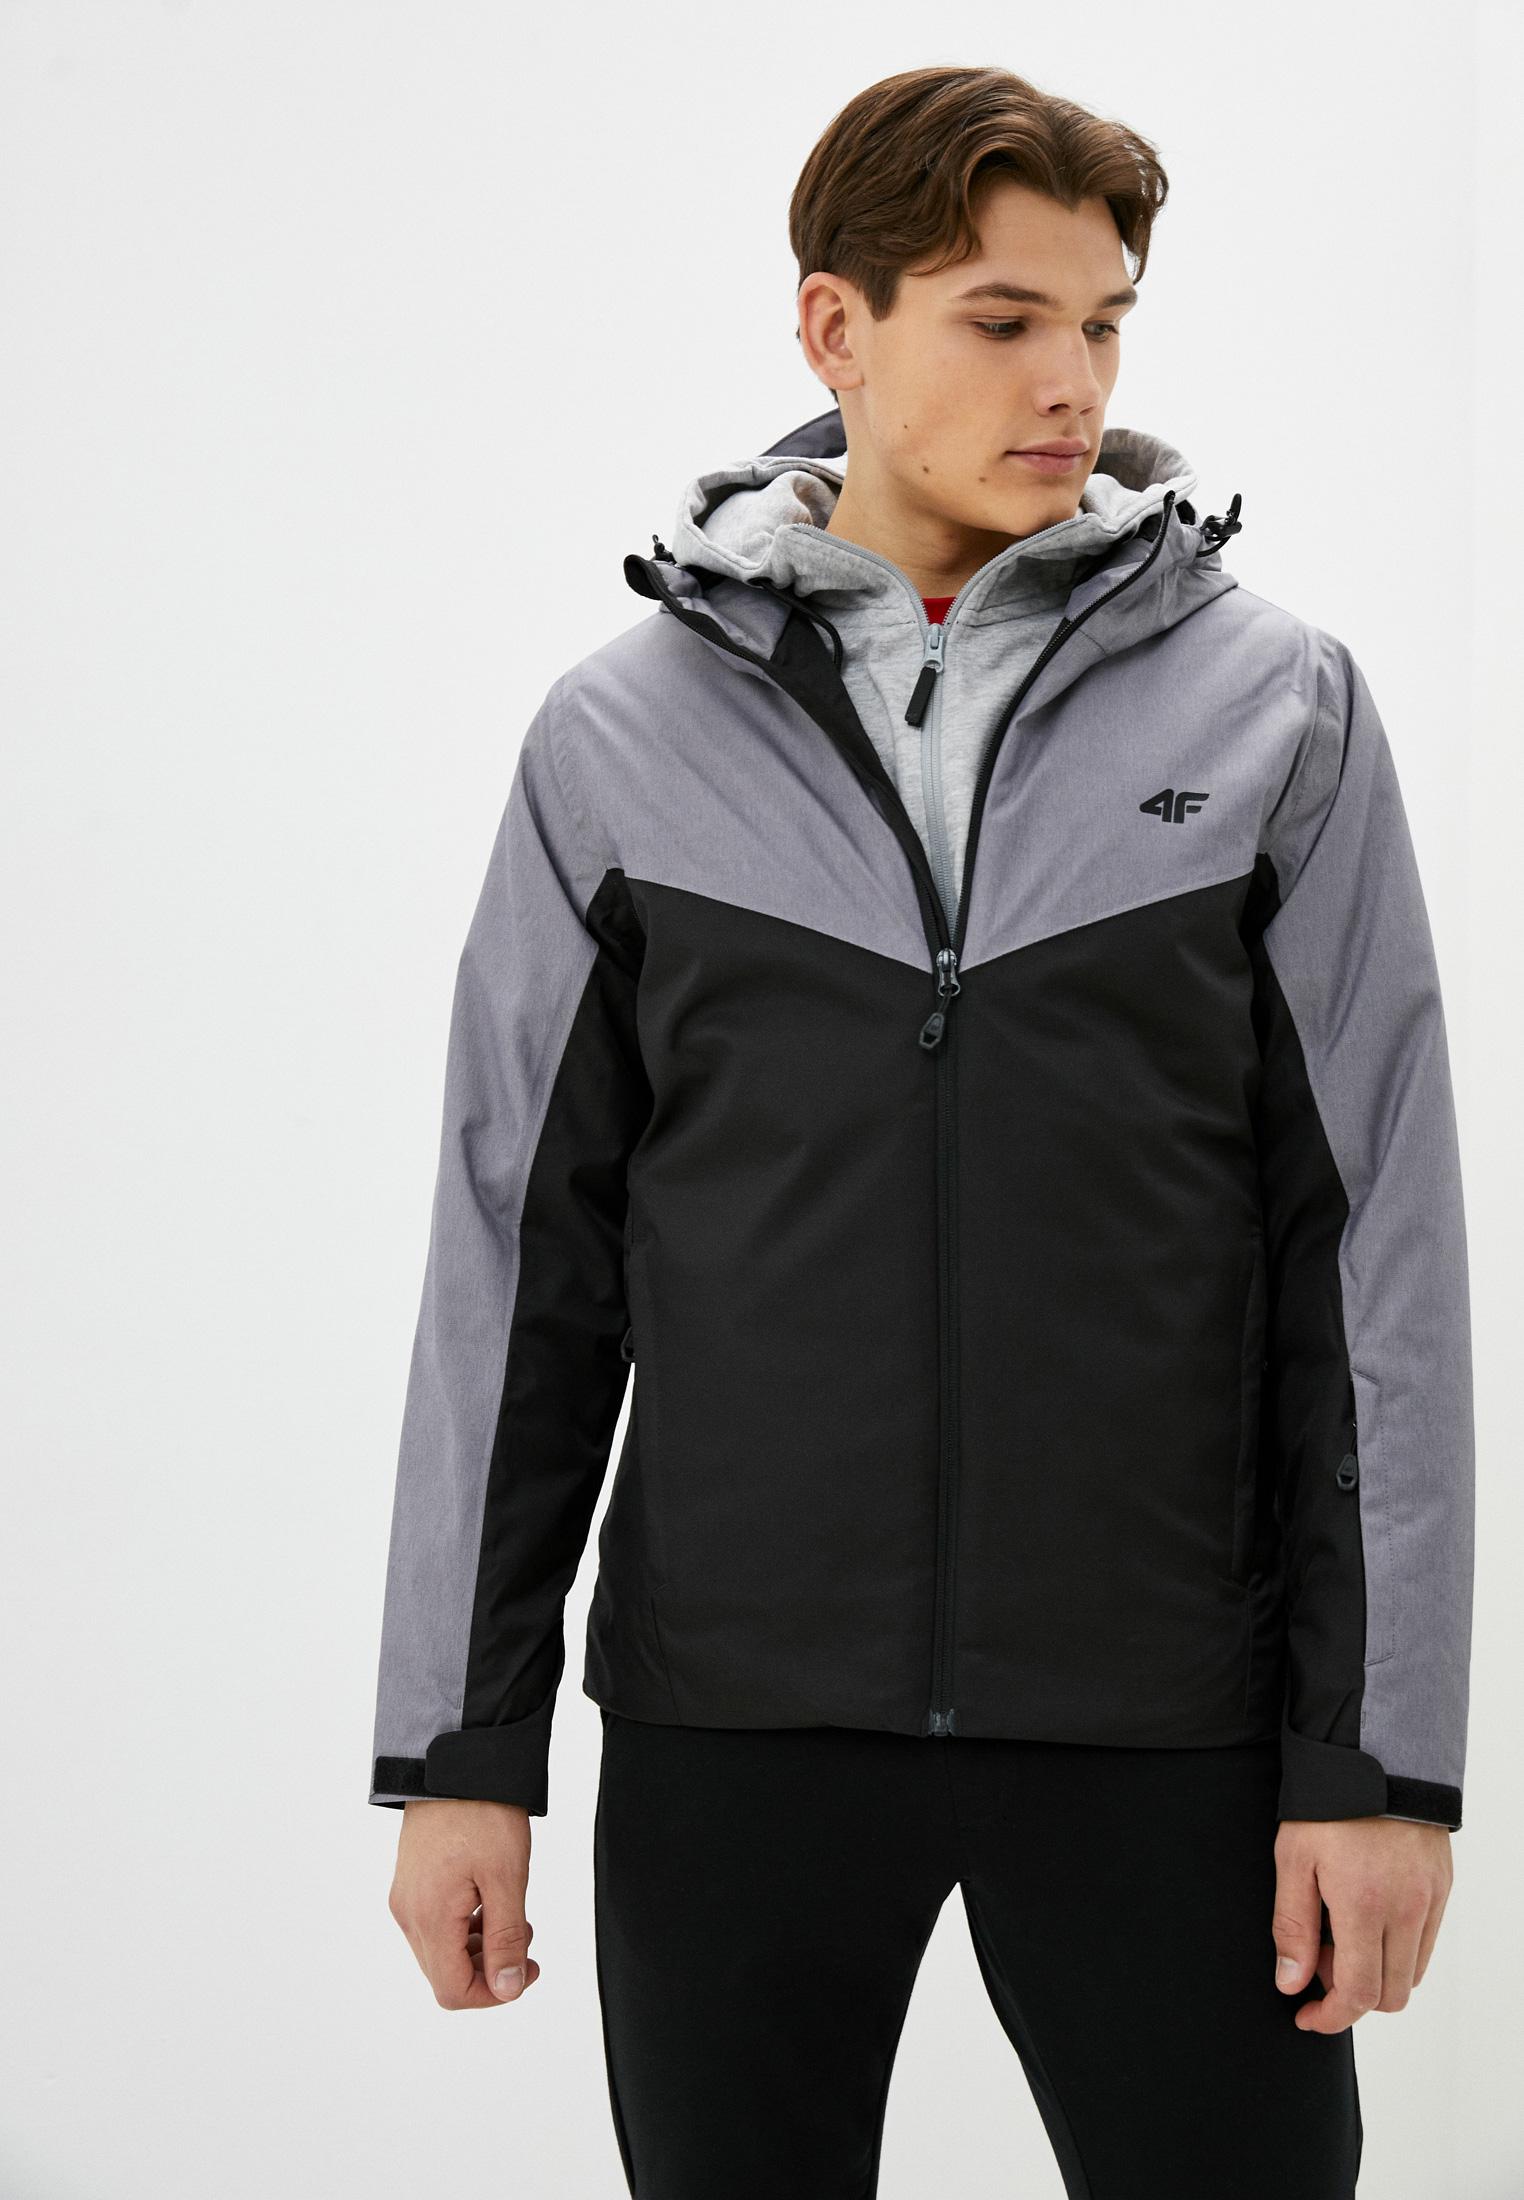 Мужская верхняя одежда 4F (4Ф) H4Z20-KUMN002